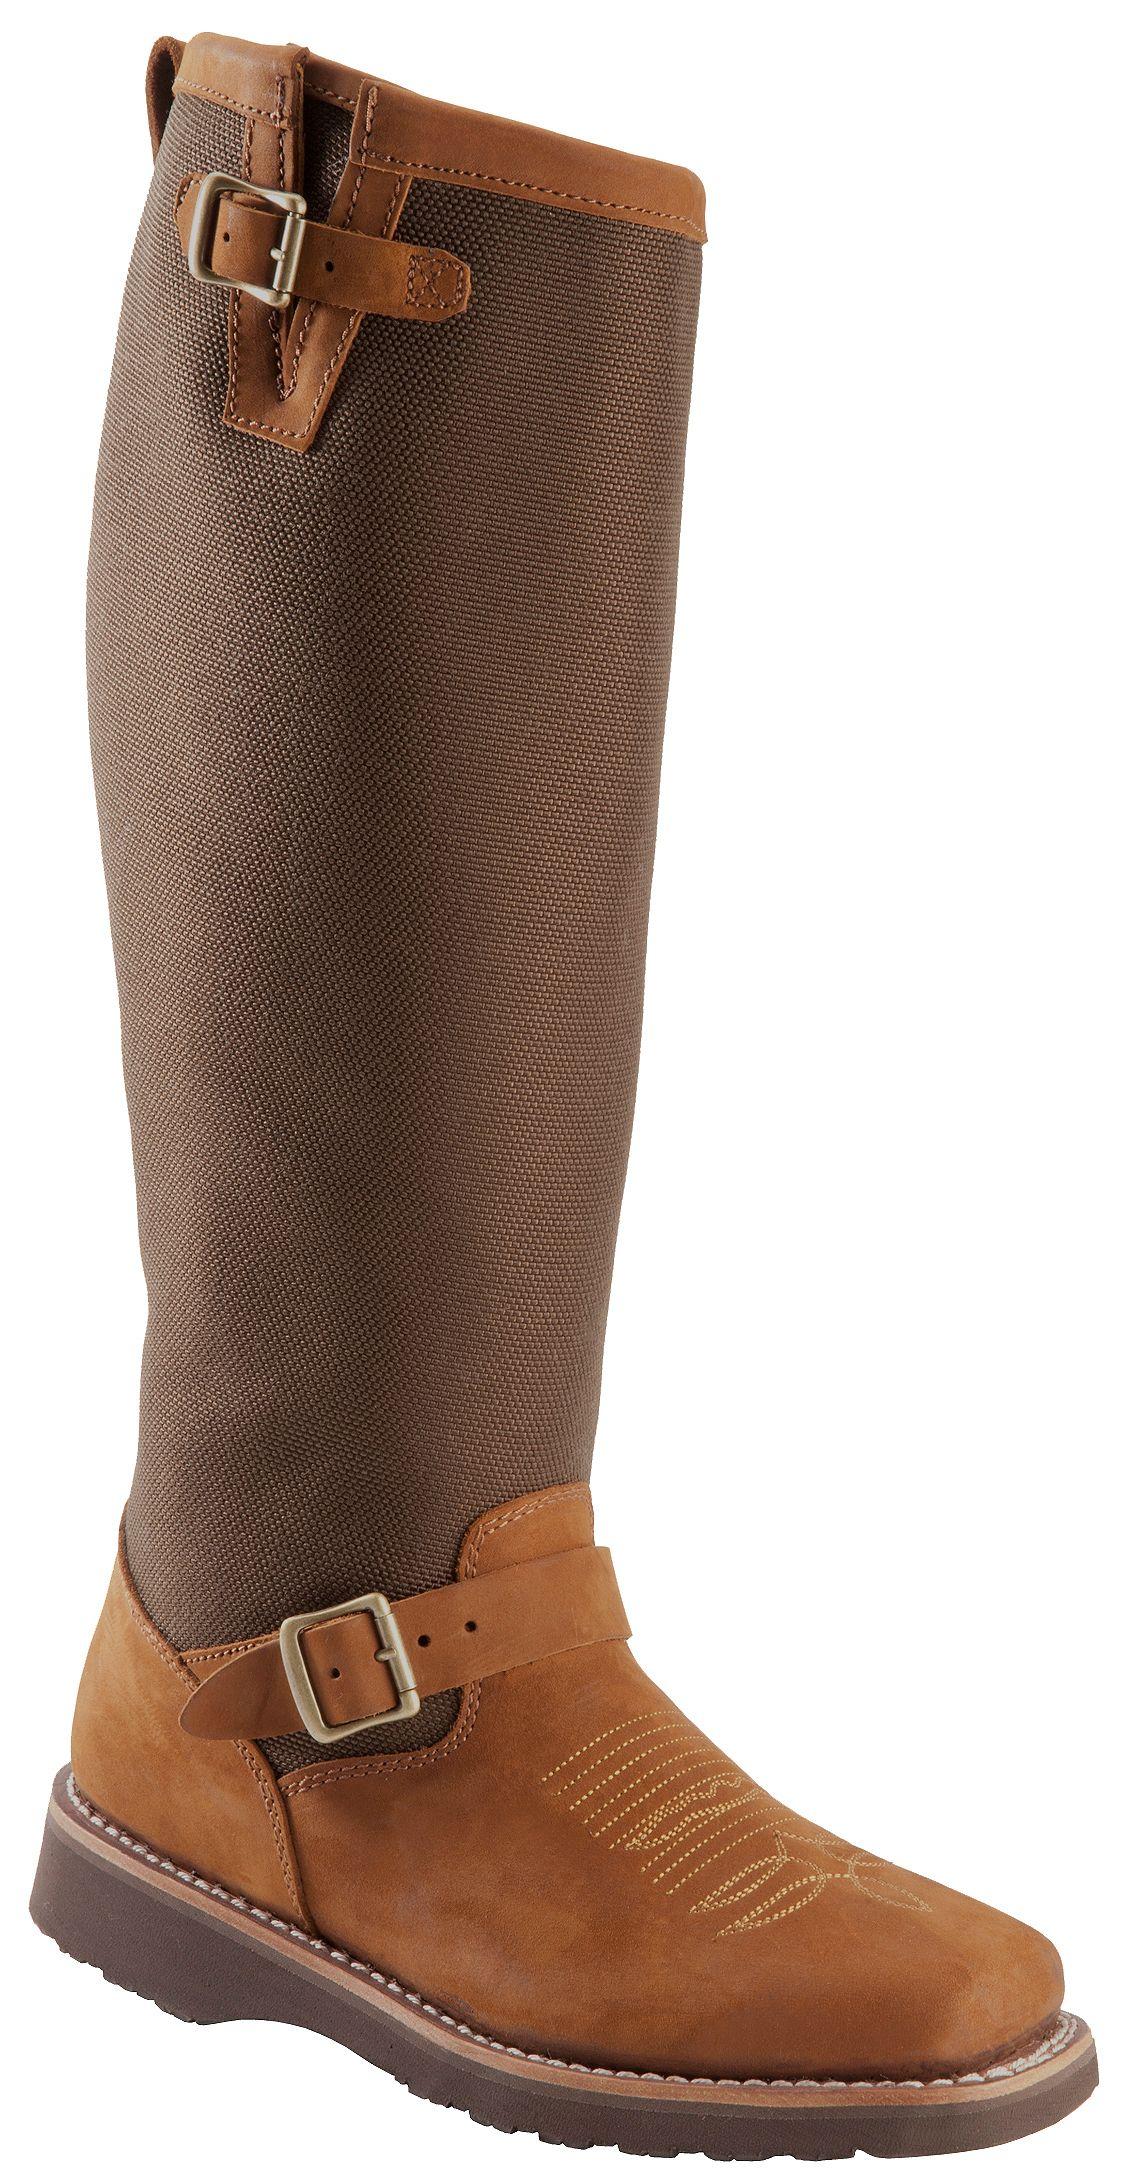 chippewa aged regina snake boots square toe sheplers. Black Bedroom Furniture Sets. Home Design Ideas